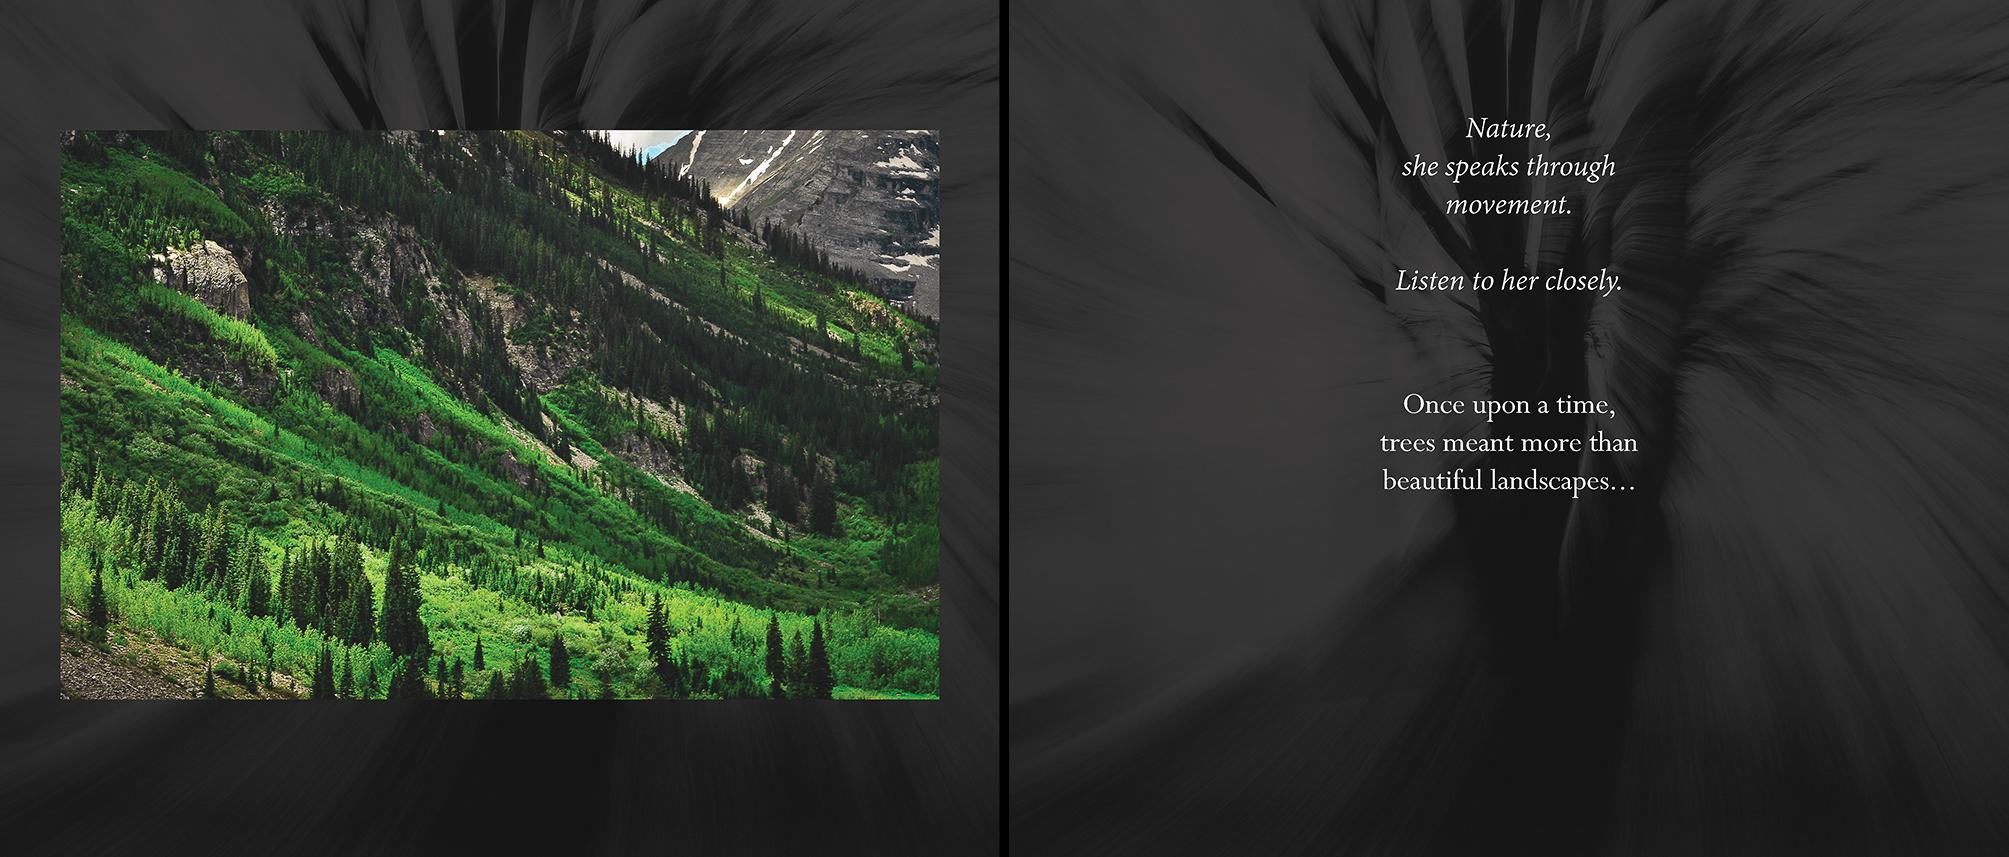 Carlin - Tree Whispers v2012_Page_03-4.jpg